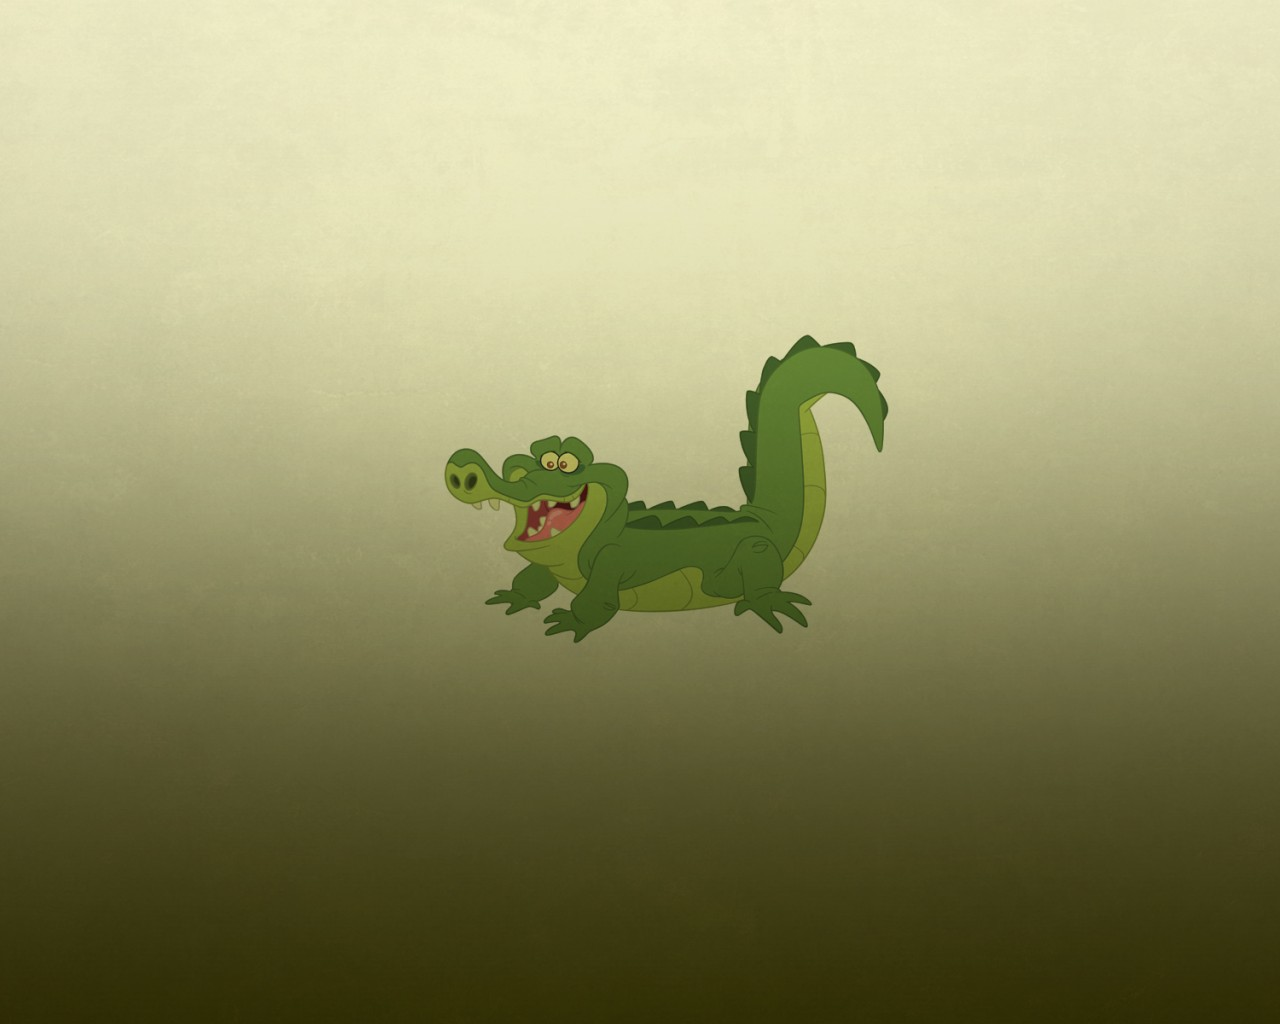 крокодил фото на рабочий стол